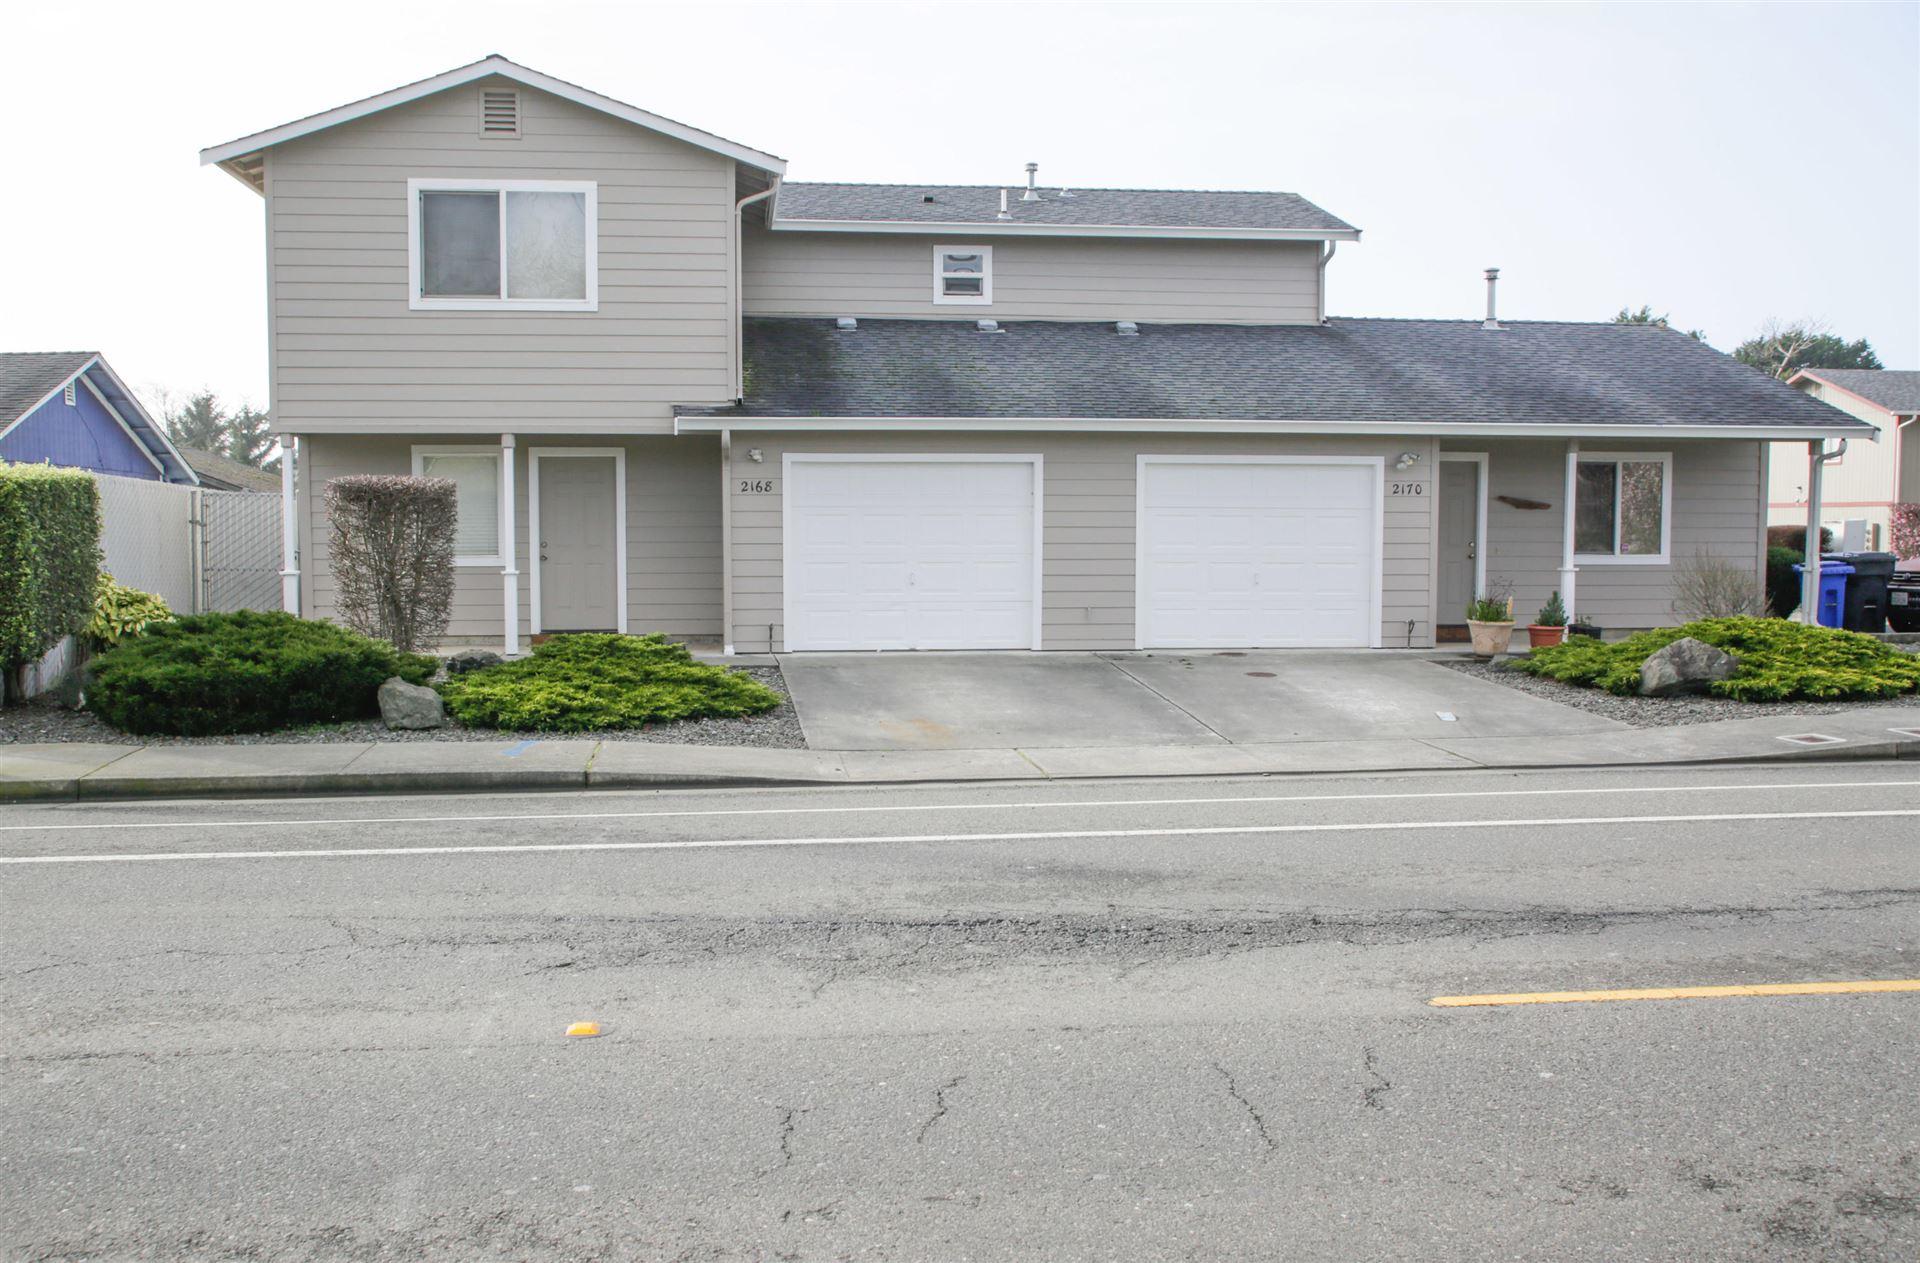 2168 Mckinleyville Avenue, McKinleyville, CA 95519 - MLS#: 255529